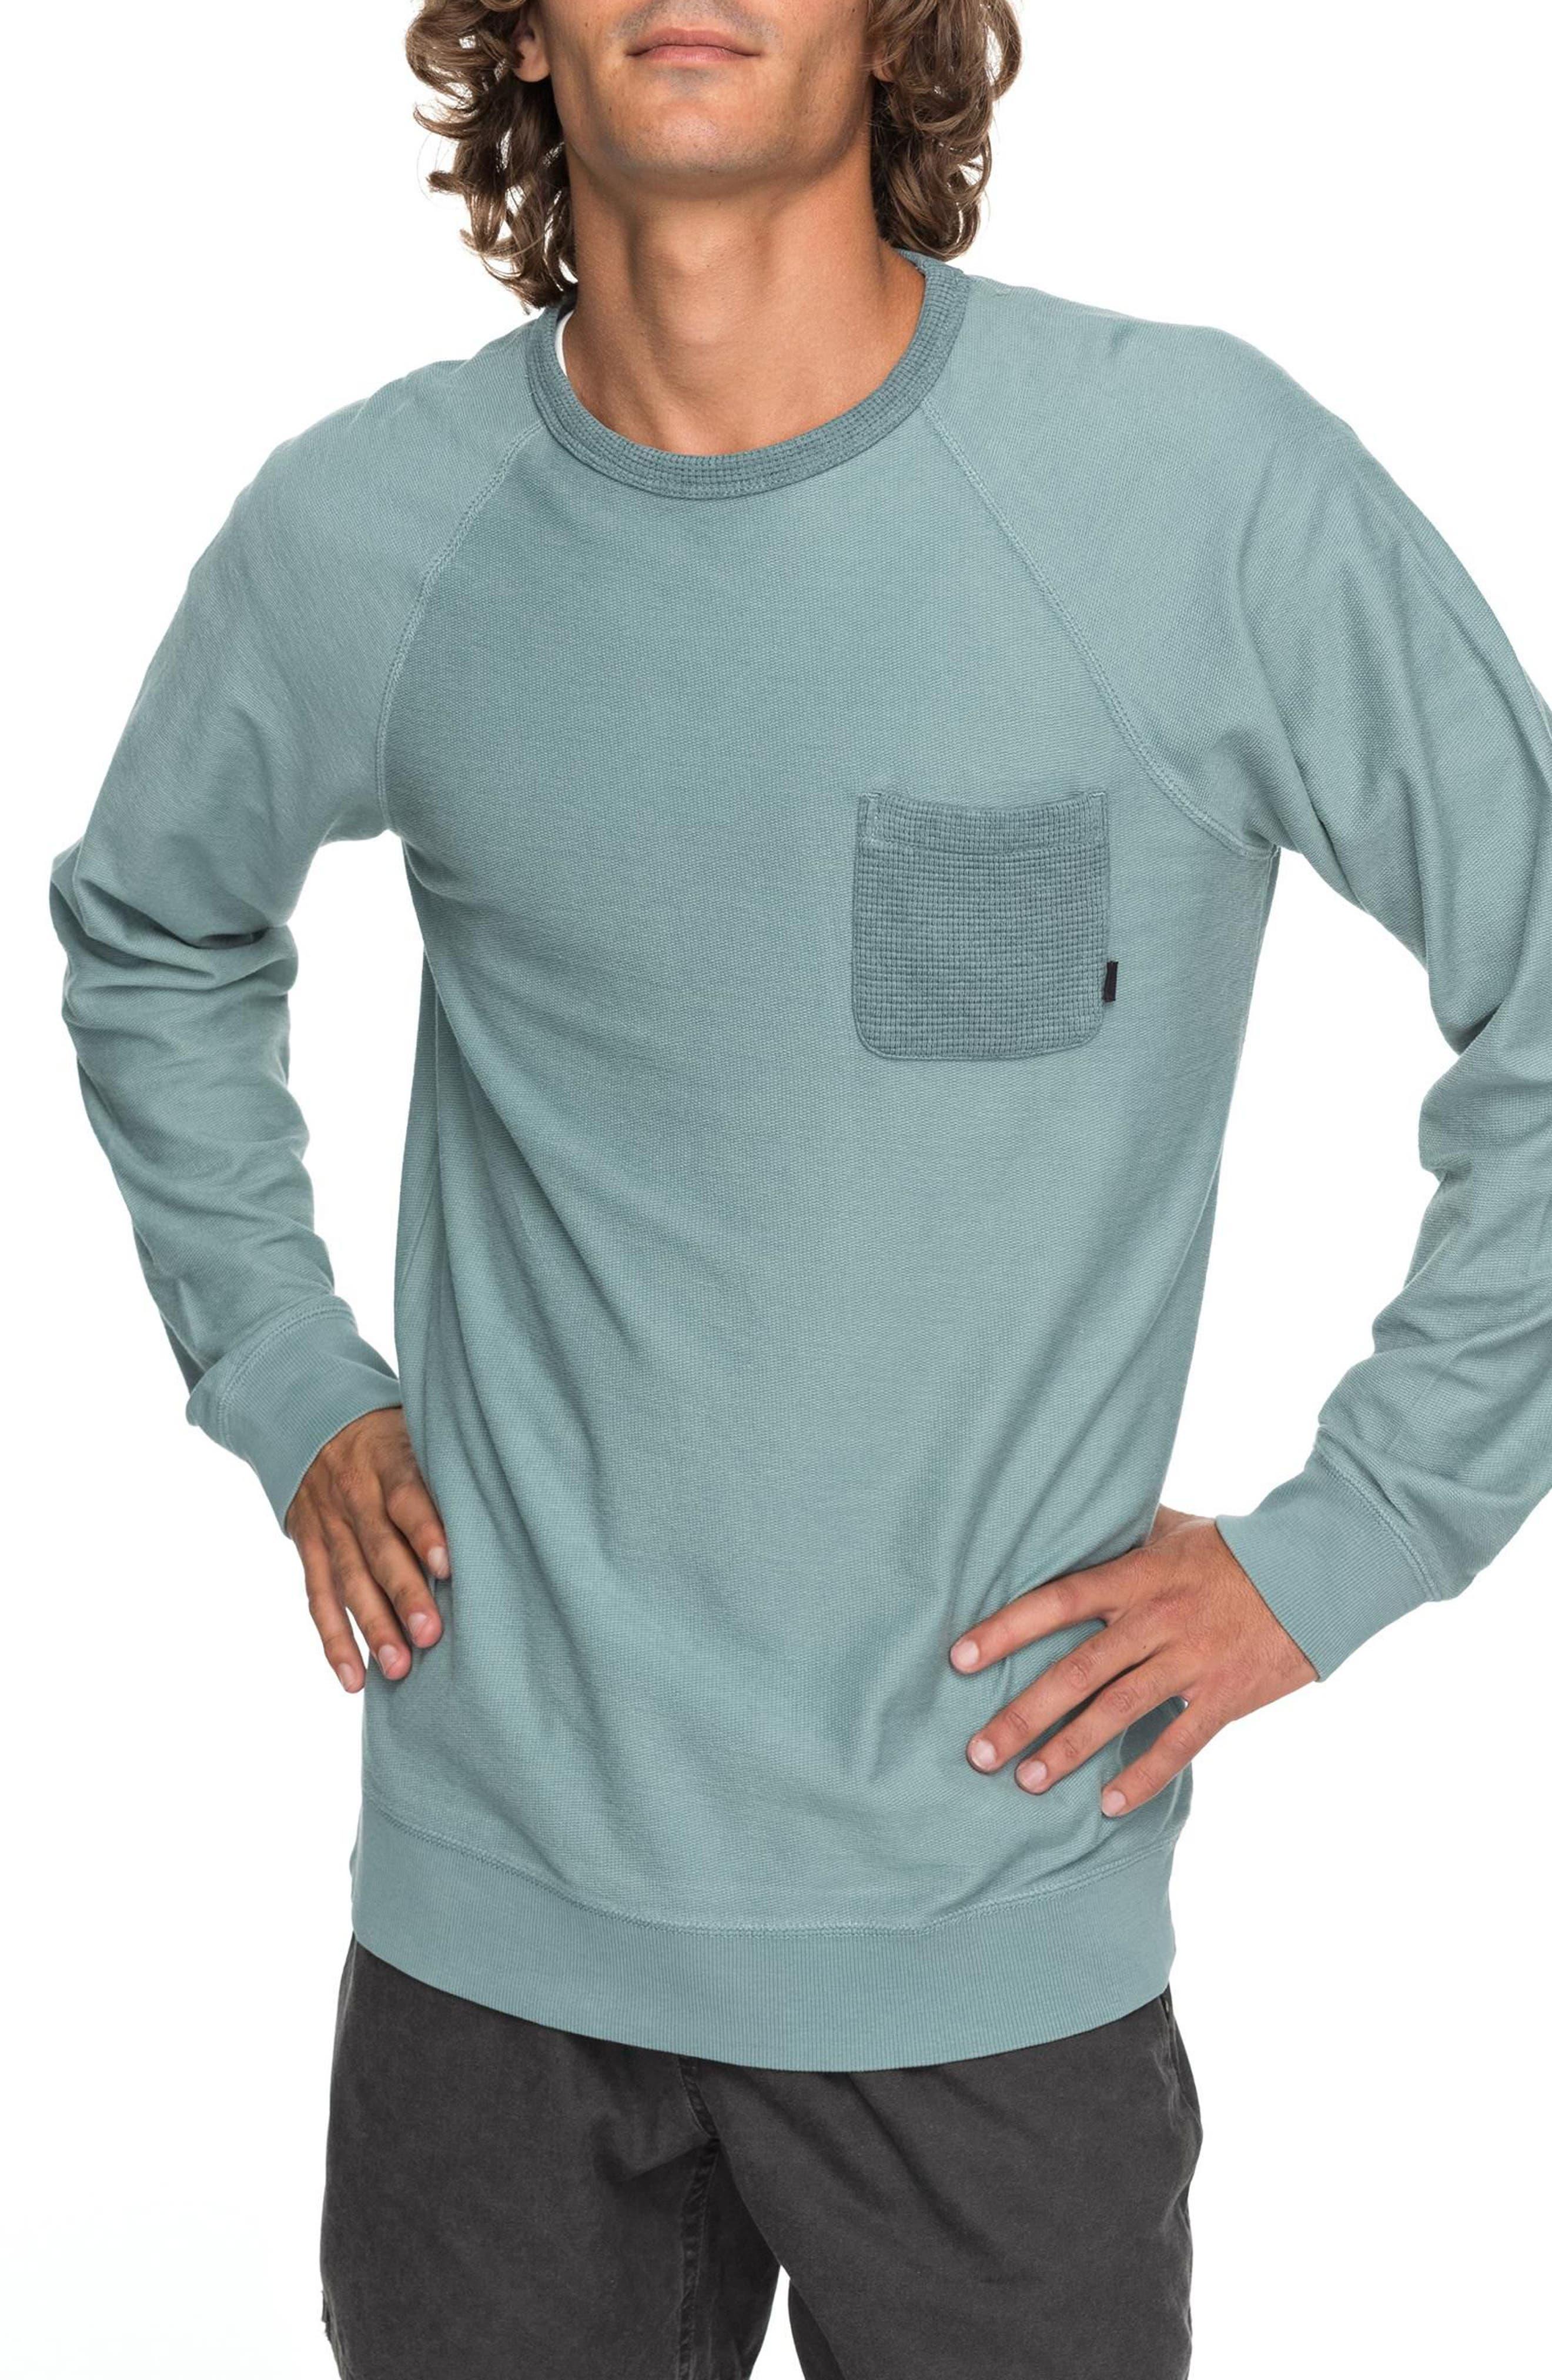 Baao Sweatshirt,                             Main thumbnail 1, color,                             Trellis